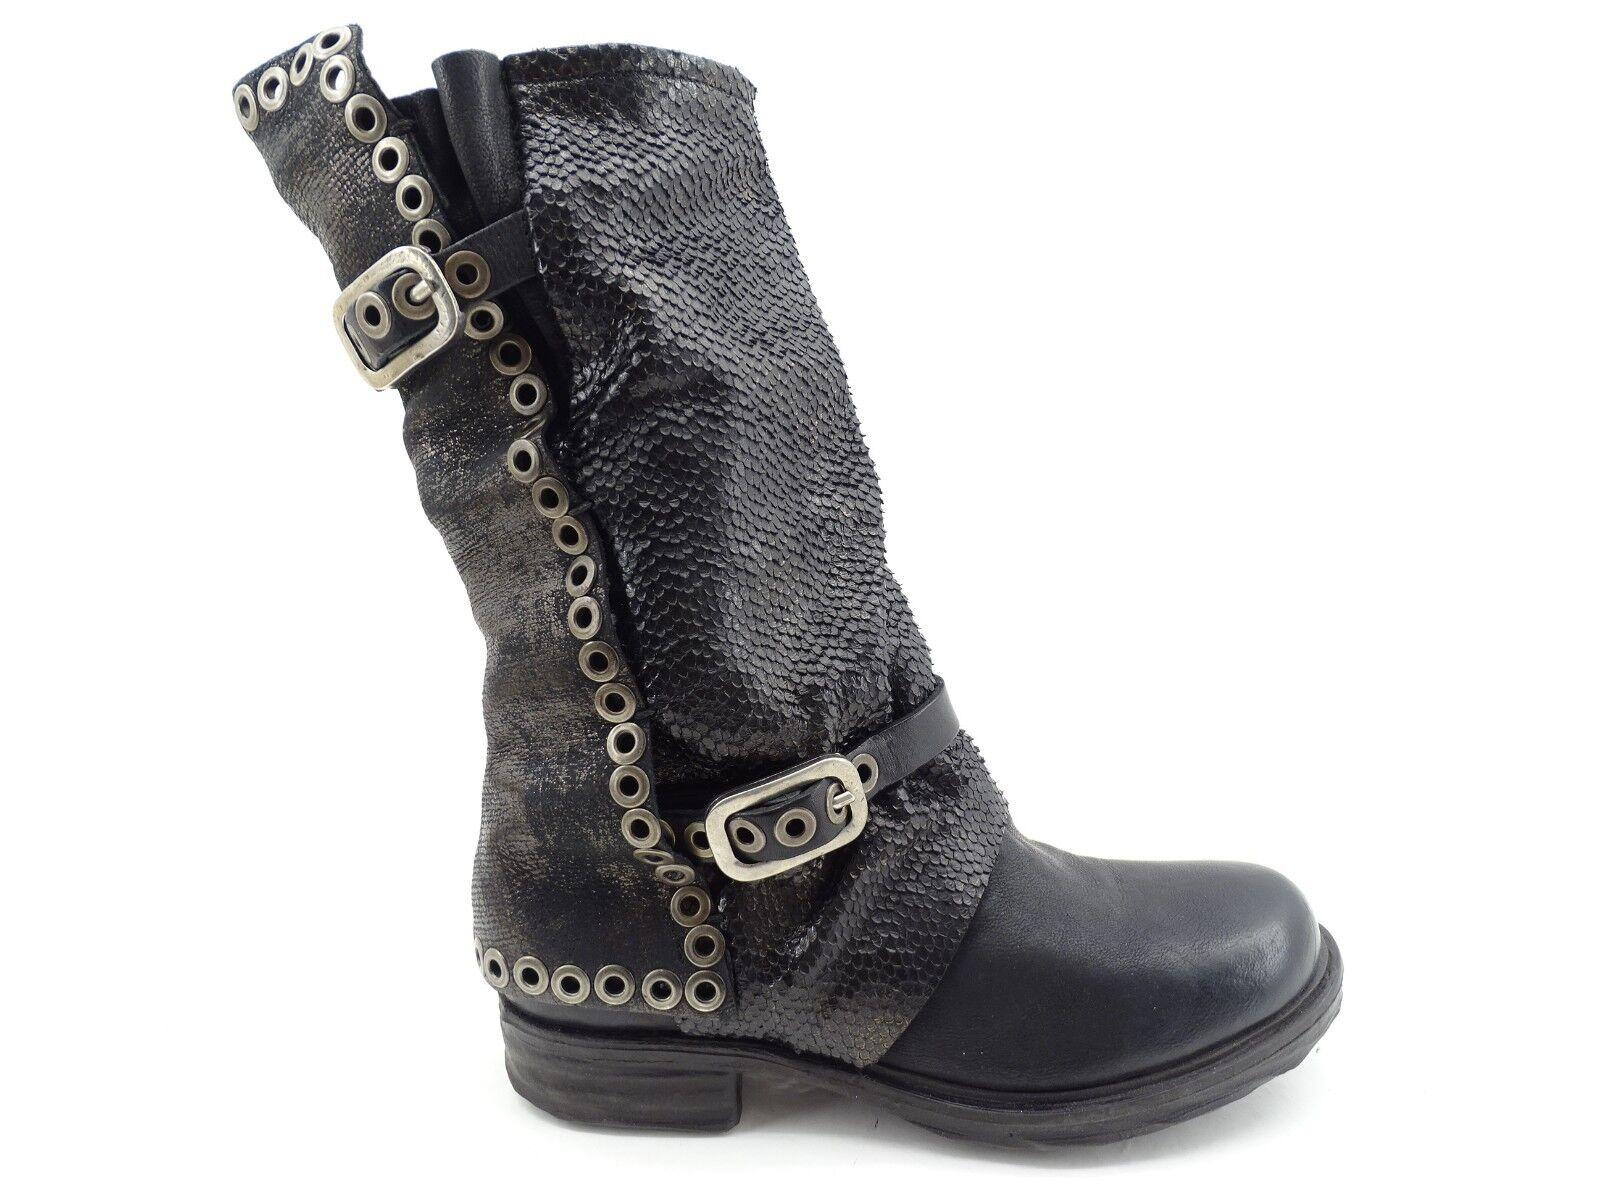 A.S.98 (AirStep) Stiefel für Damen Stiefel Stiefelette (Schwarz) Leder Leder Leder Gr 37   5882b1